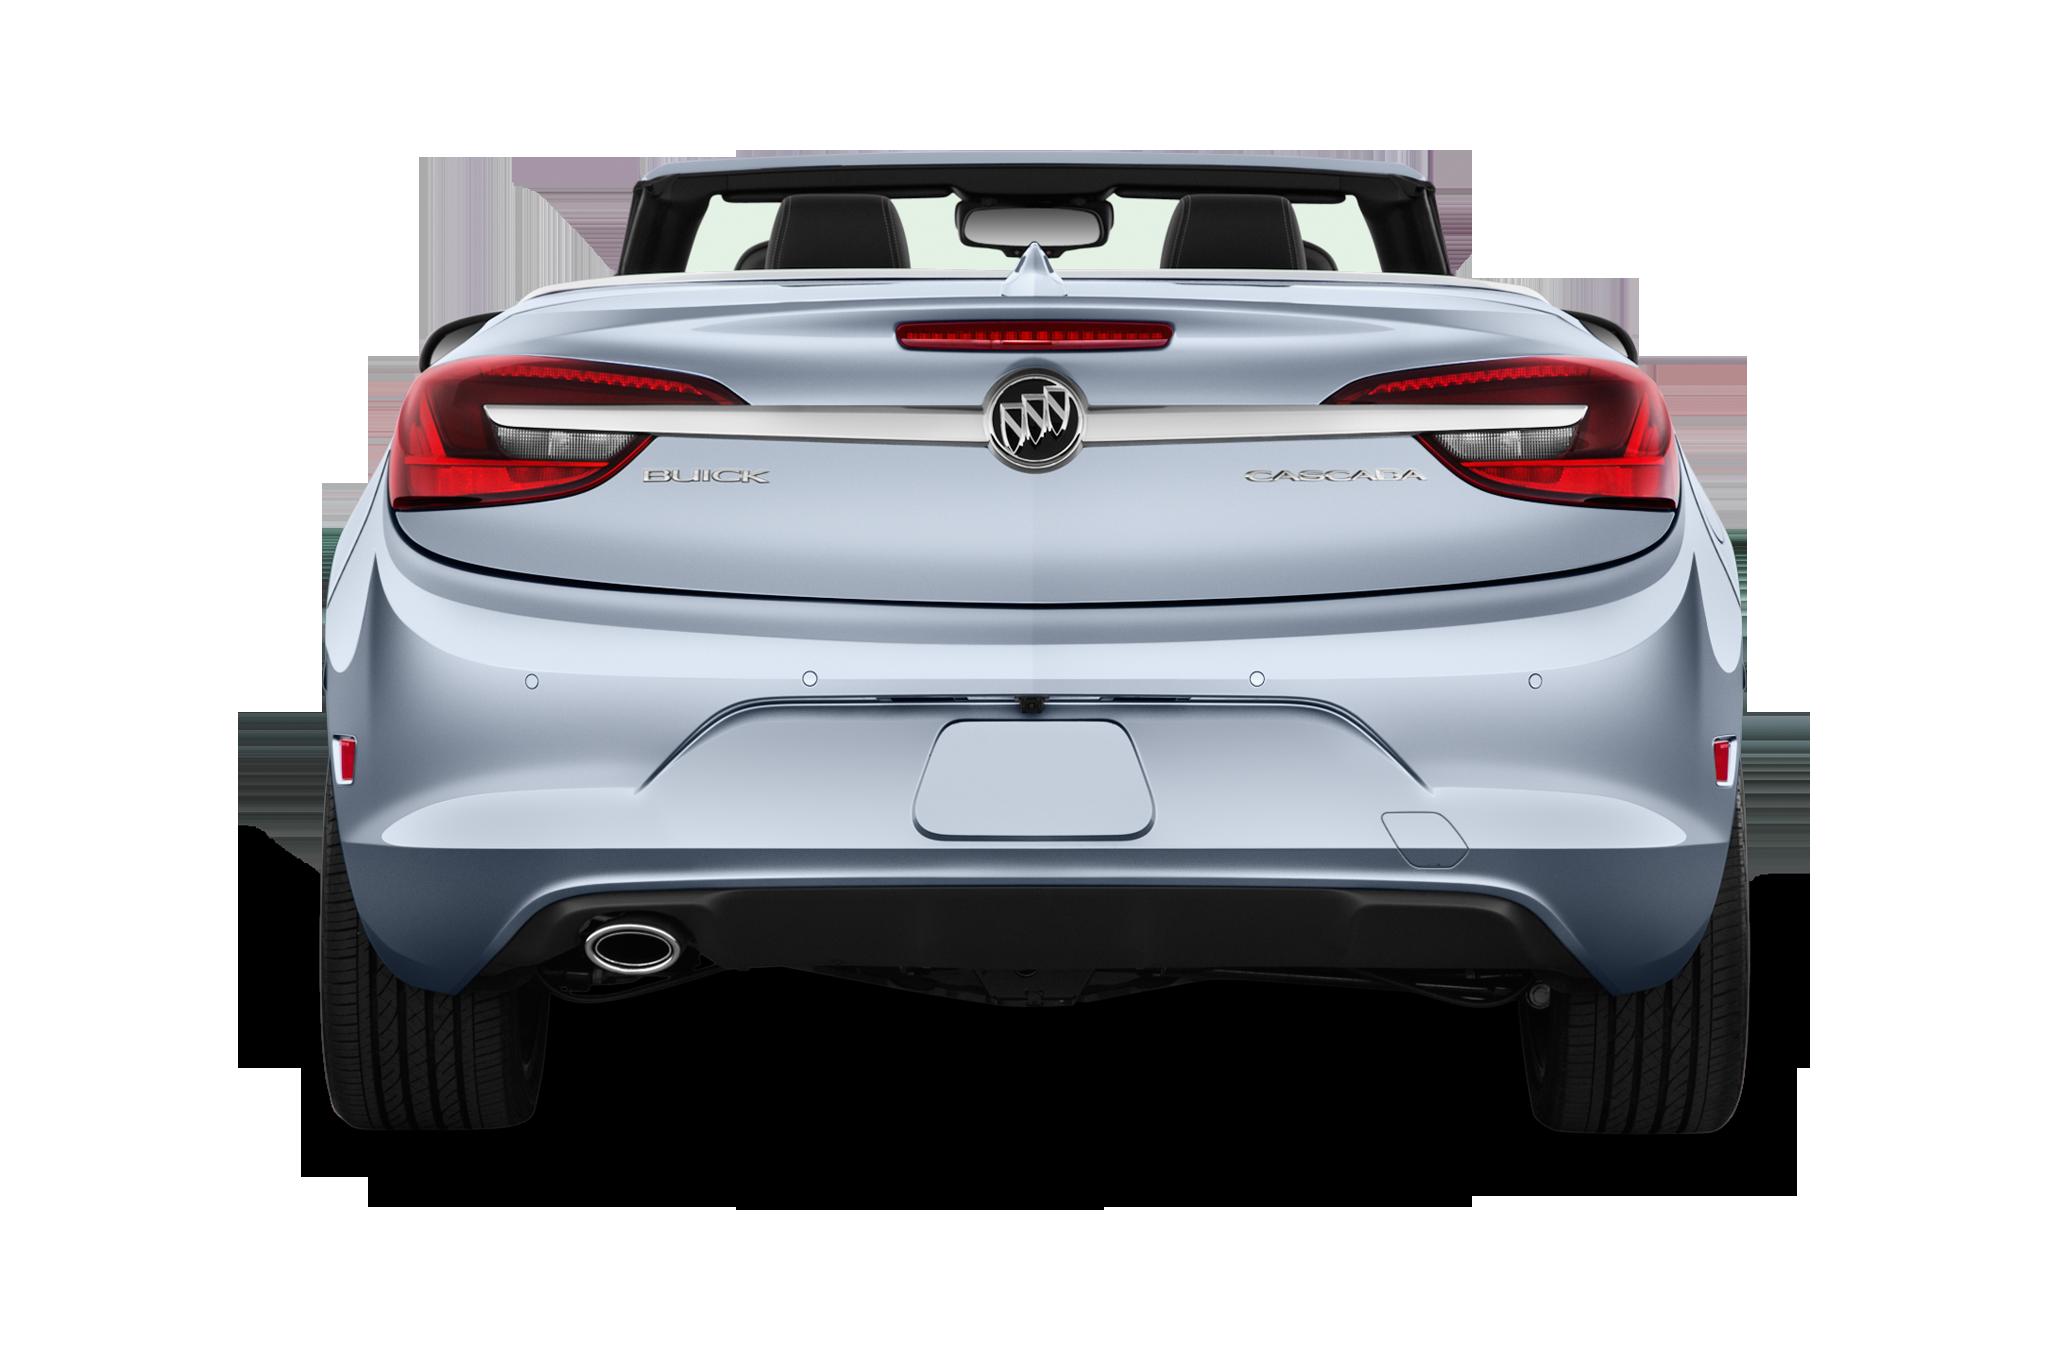 2016 Buick Cascada One Week Review | Automobile Magazine